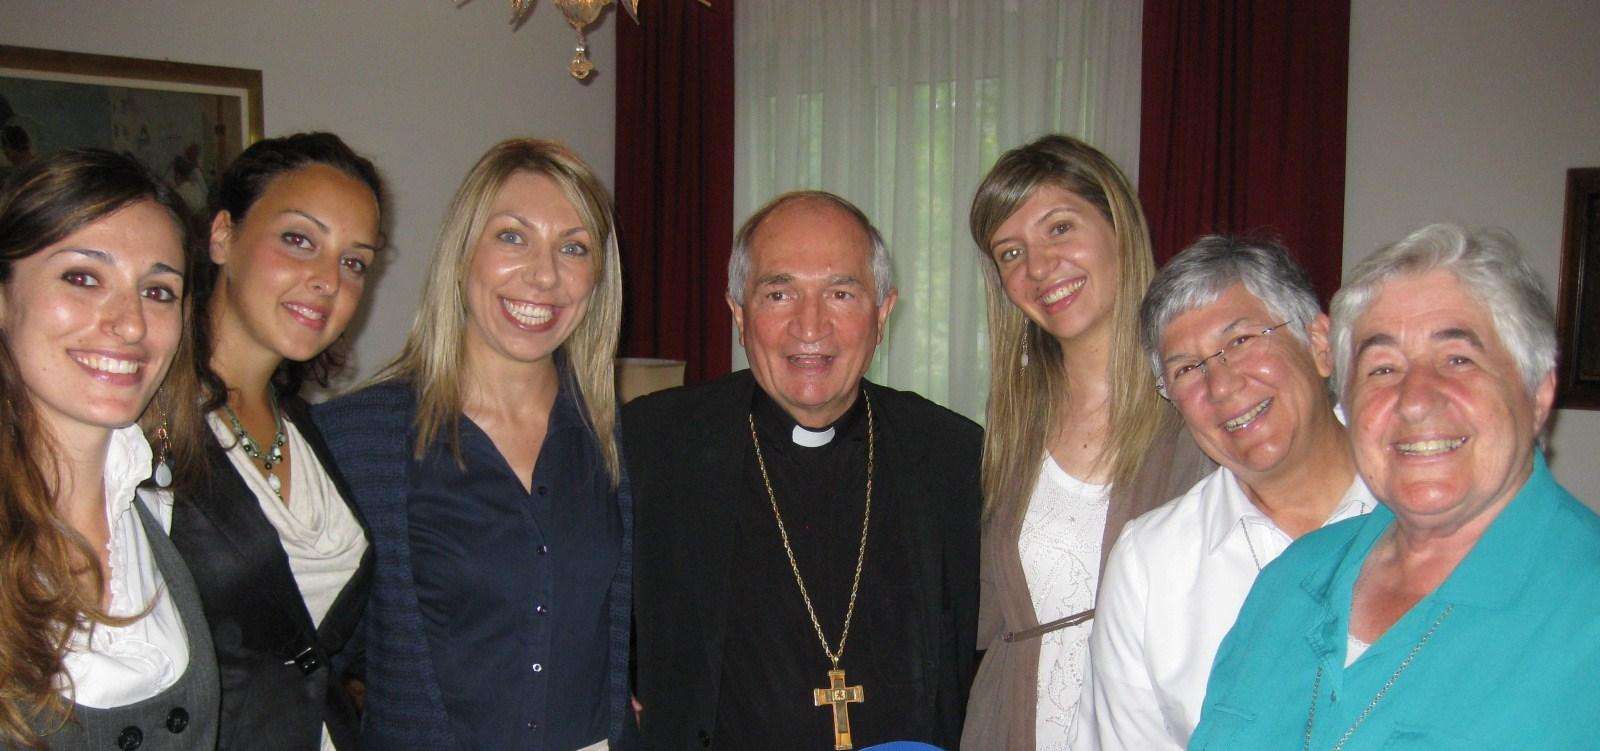 Mrg  Tomasi, Apostolic Nuncio, meets with catholic NGOs in